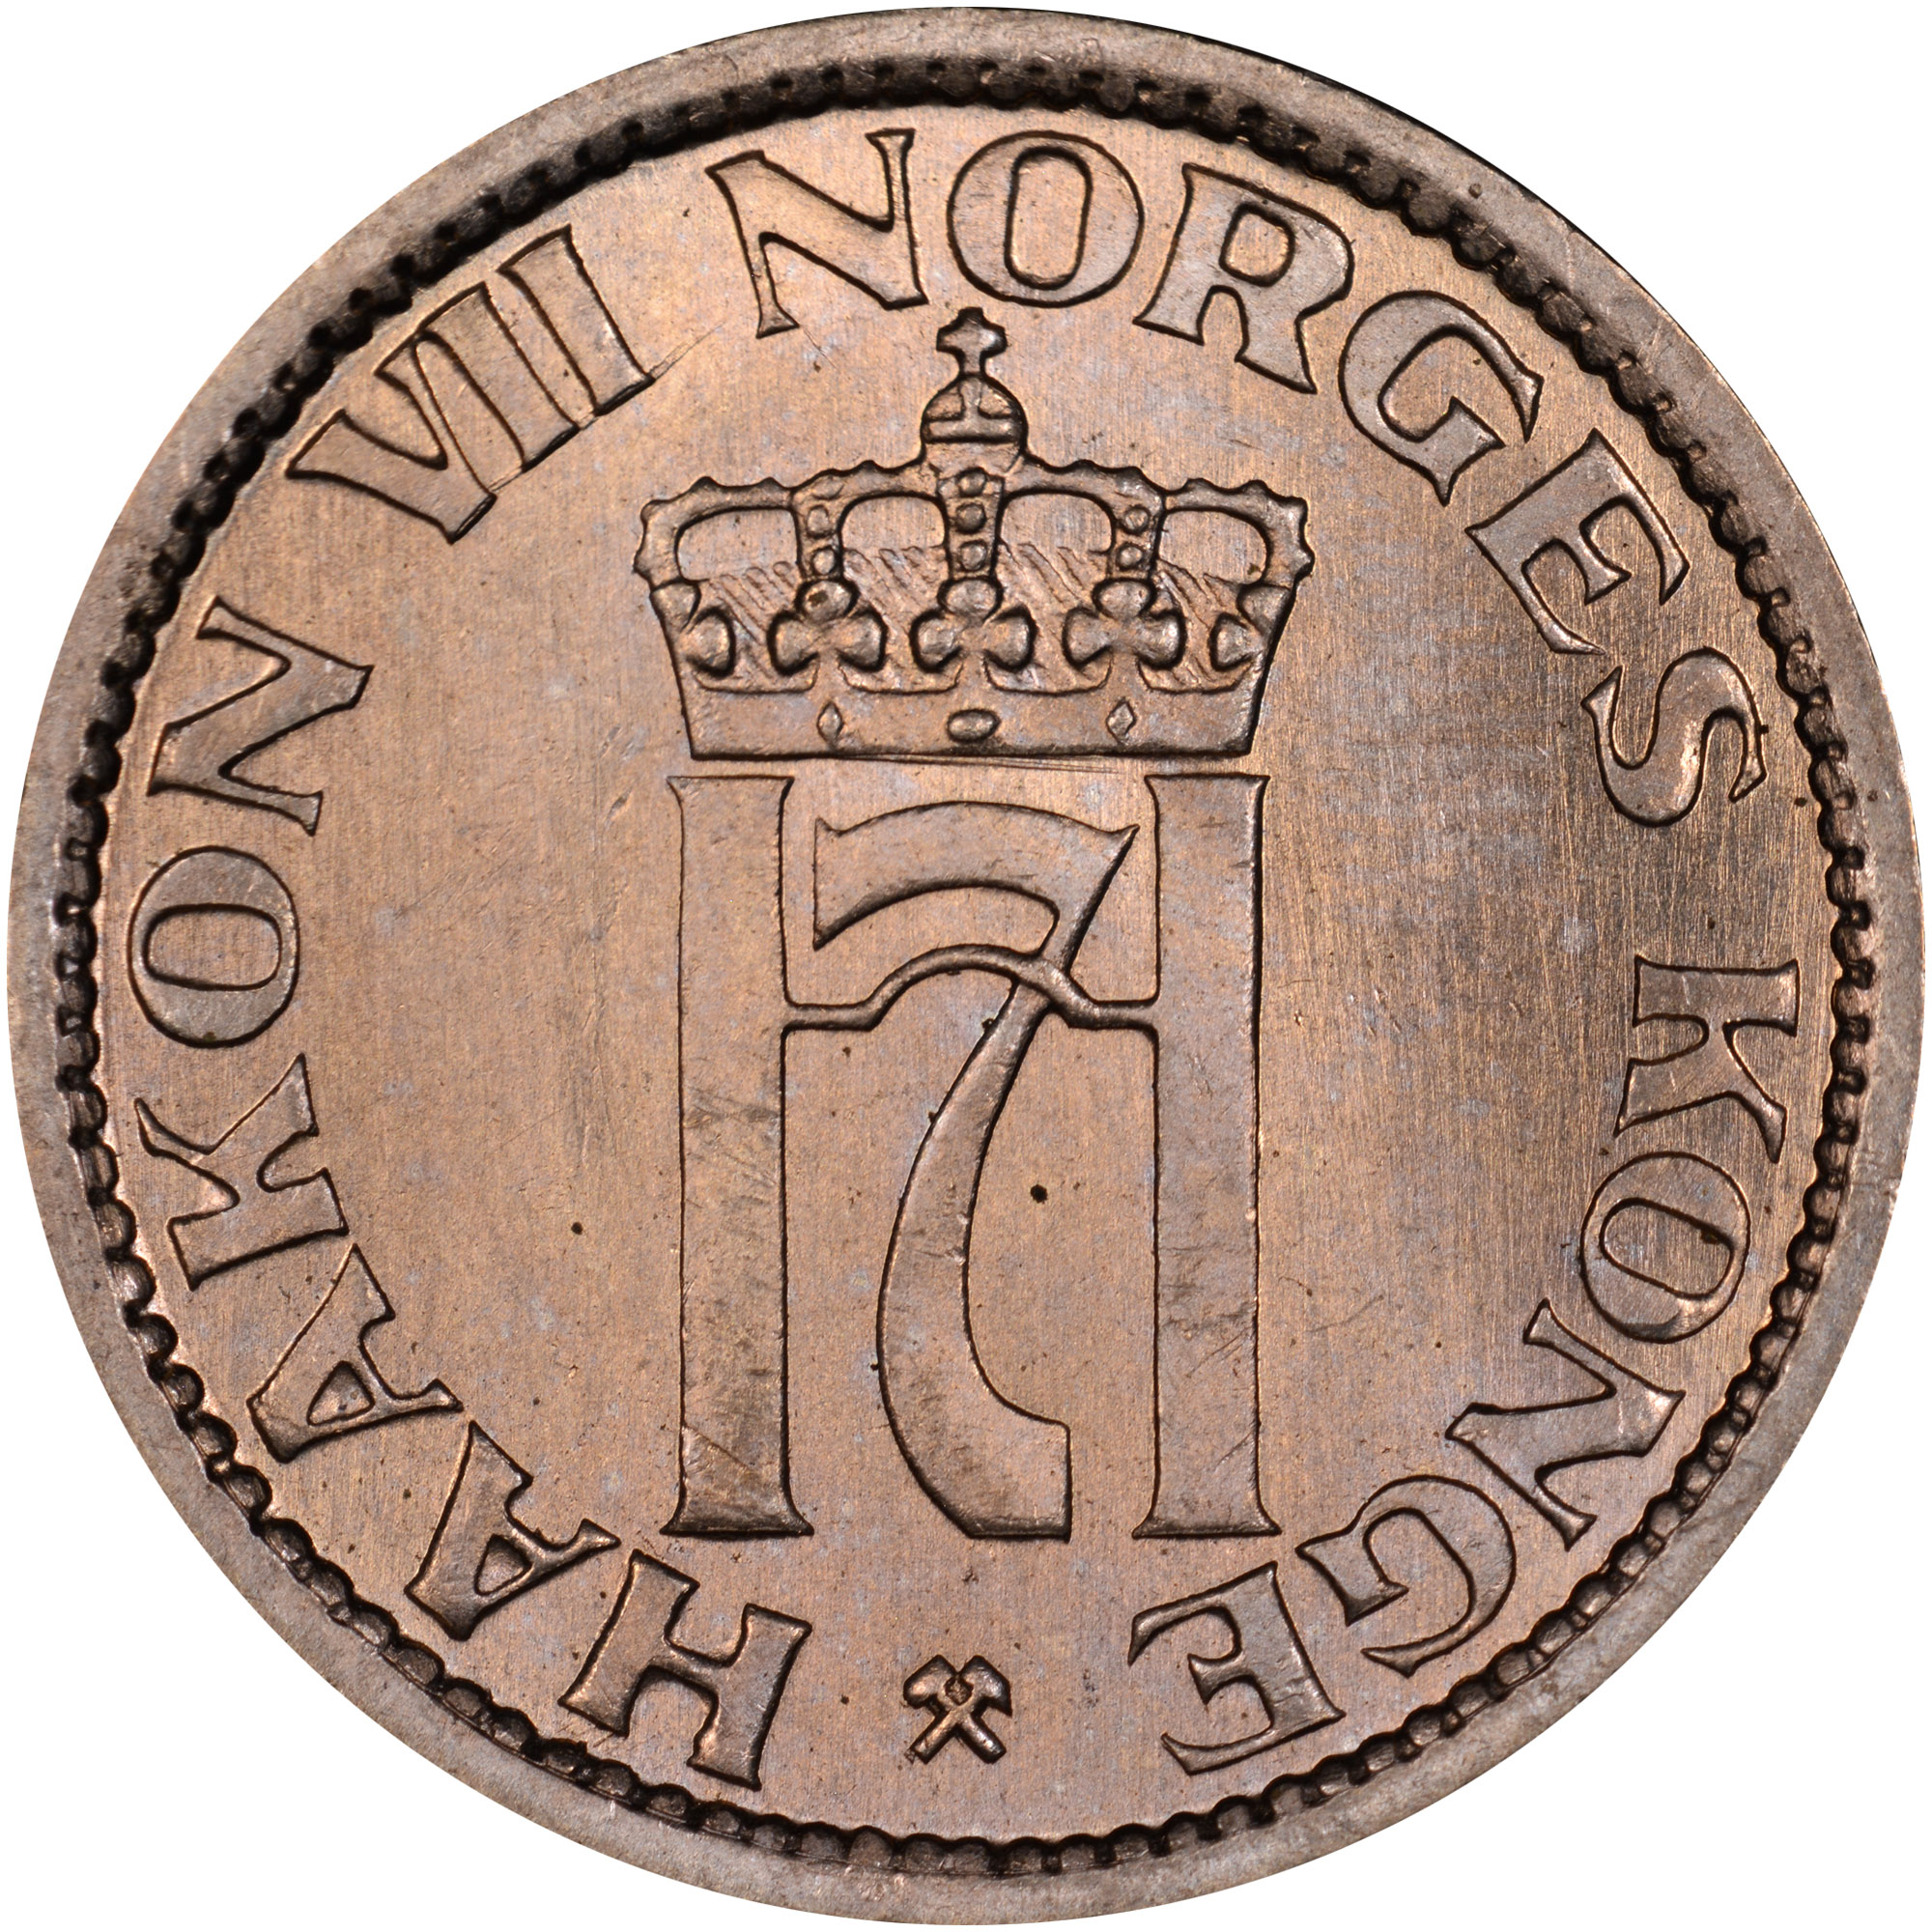 1953-1957 Norway 50 Ore obverse